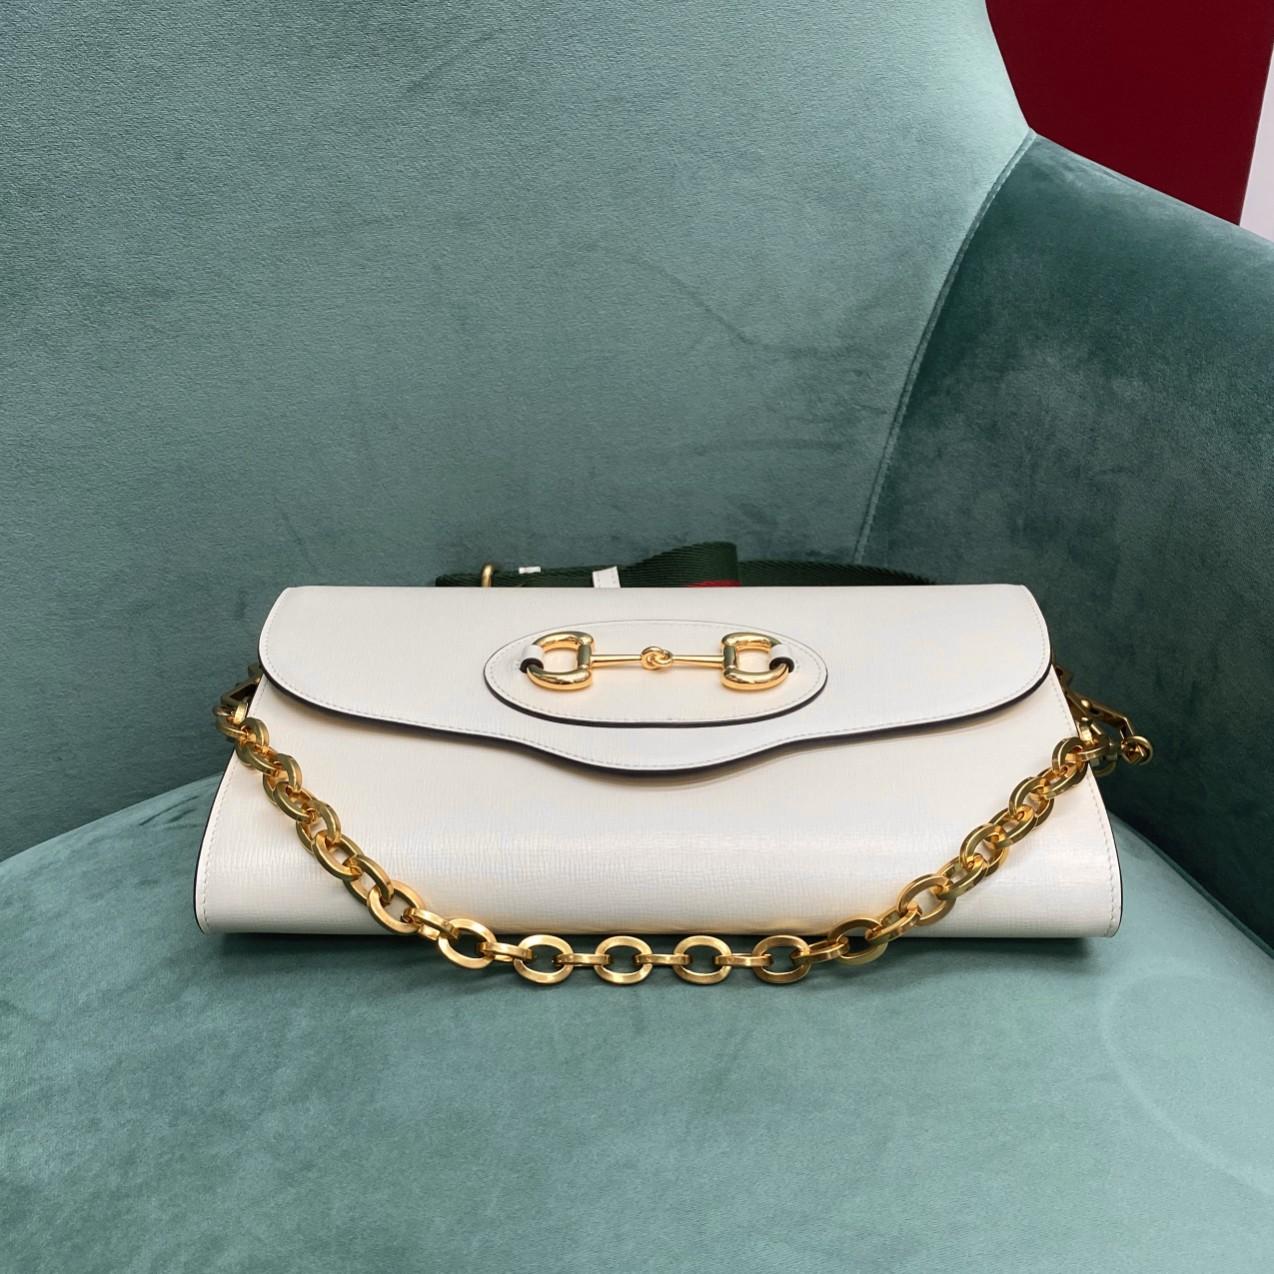 【P1050】古驰女包批发 Gucci 1955系列链条信封包斜挎腋下包 677286白色